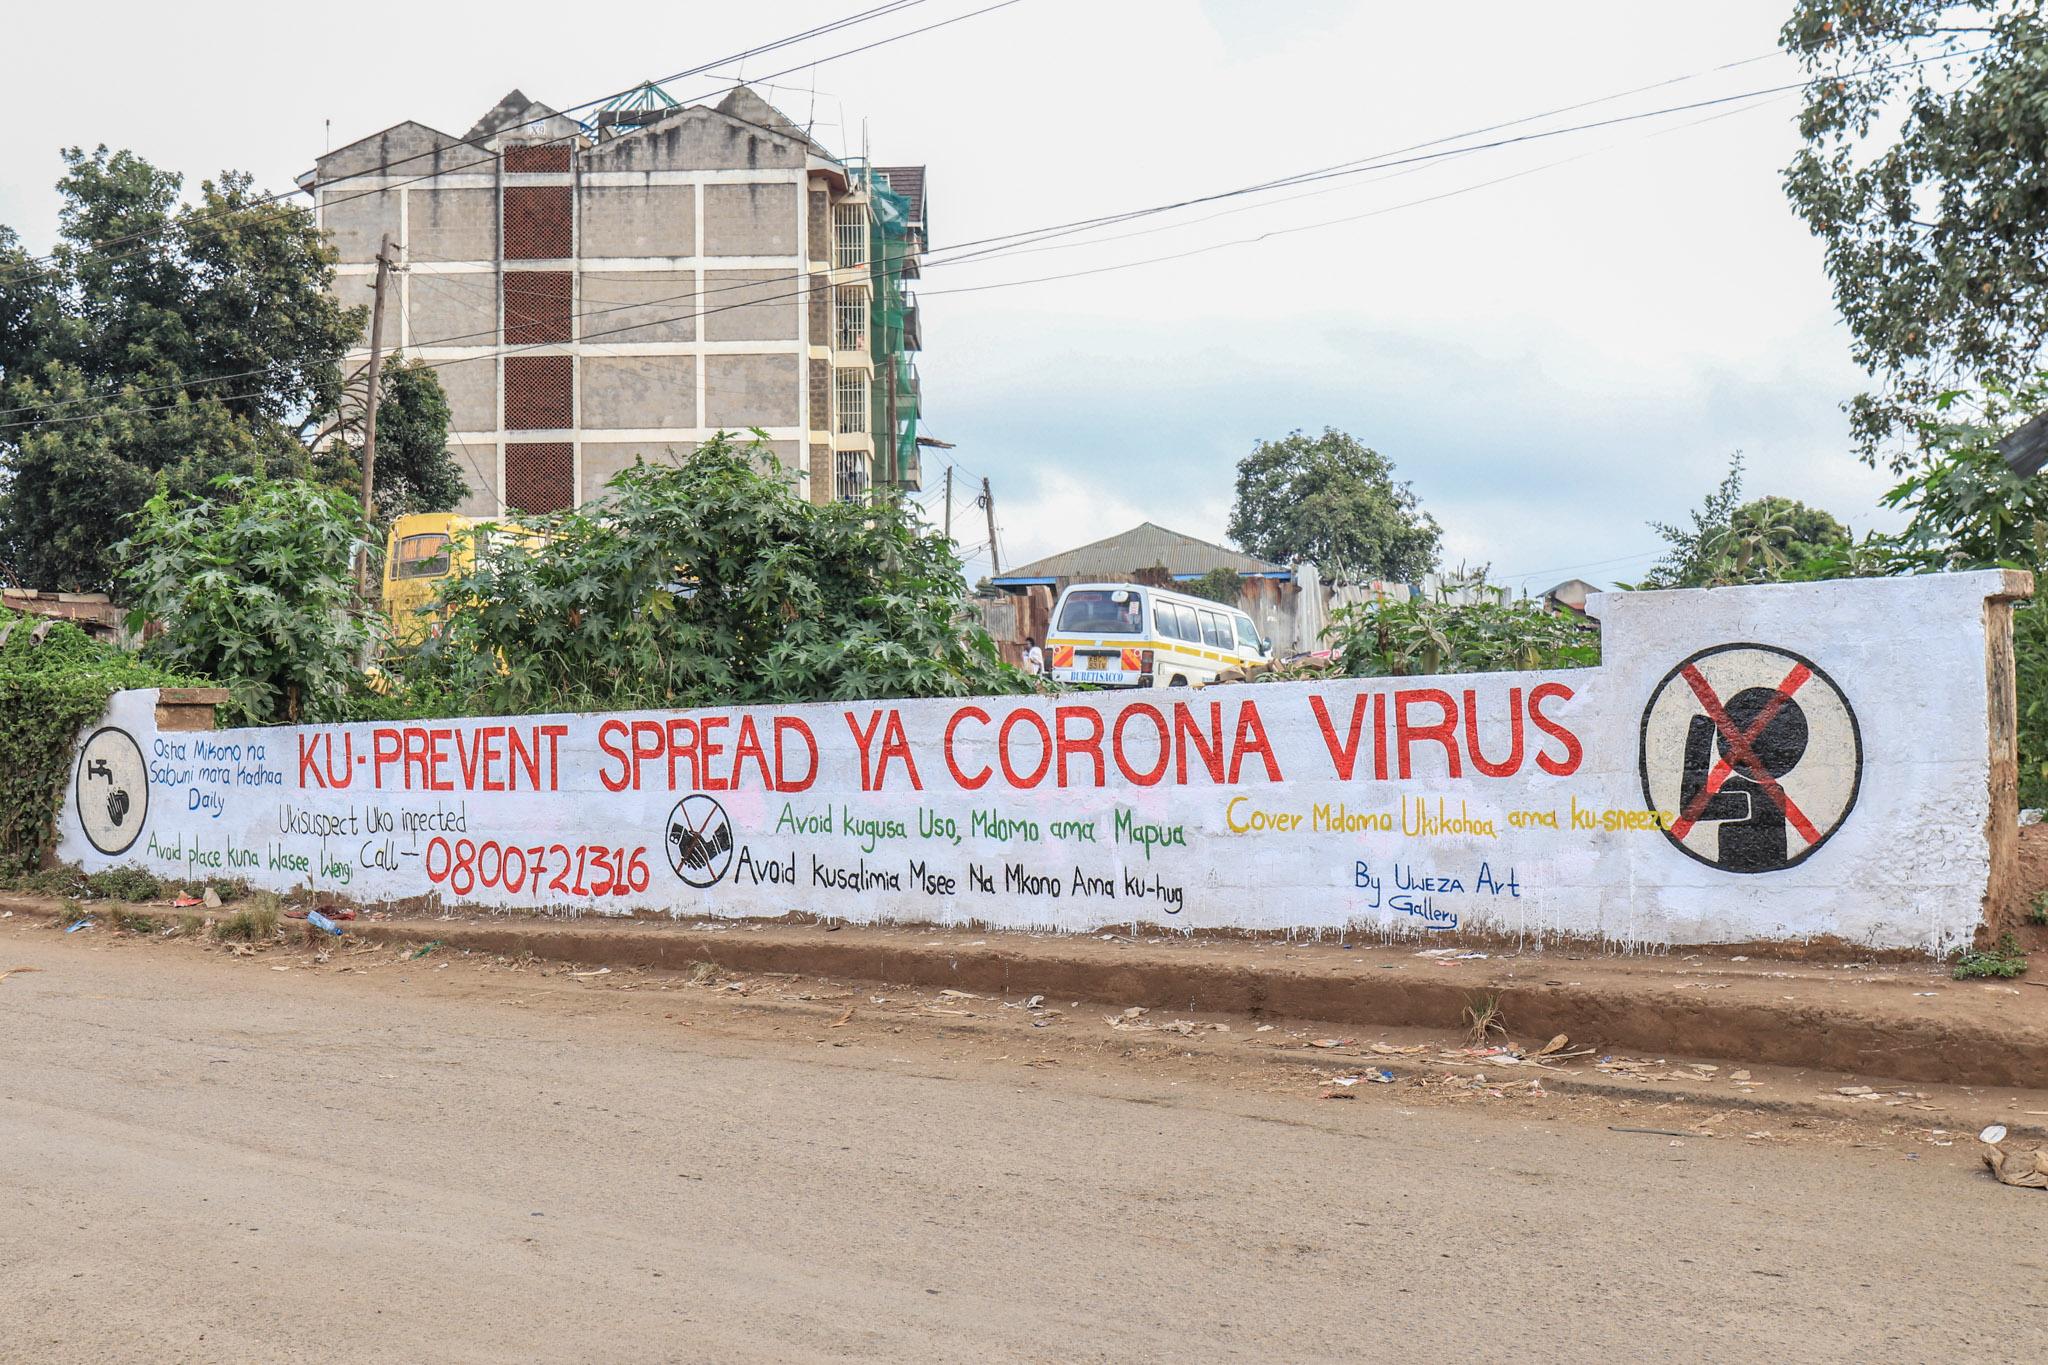 COVID-19: Protecting Kibera